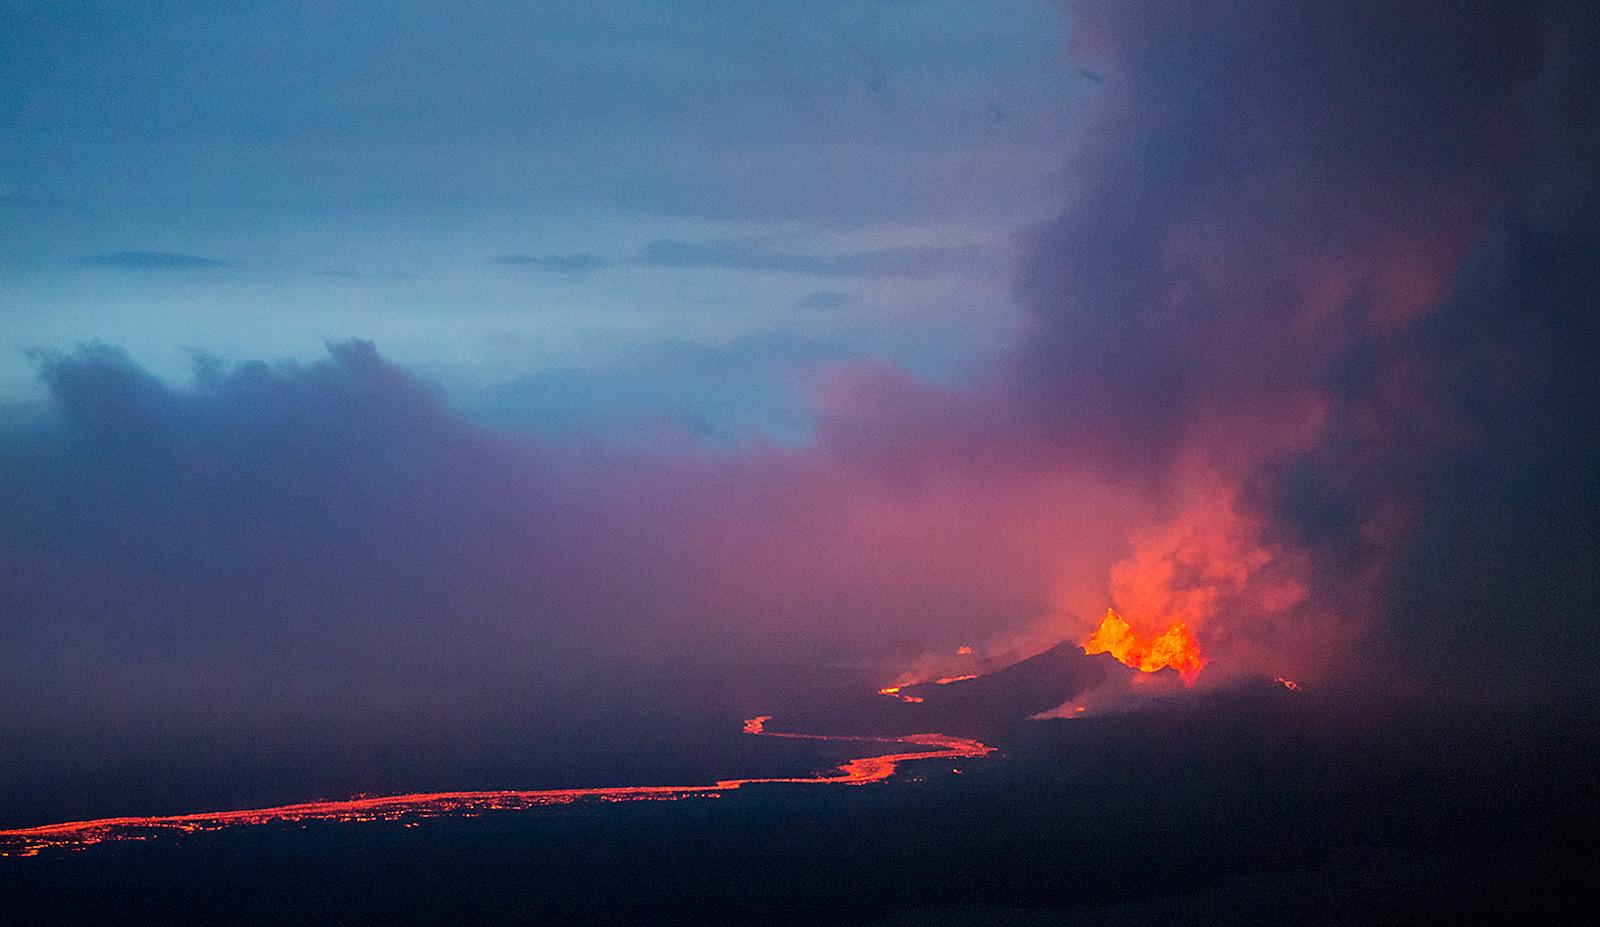 Vulkanausbruch am Bardarbunga / Holuhraun Spalteneruption